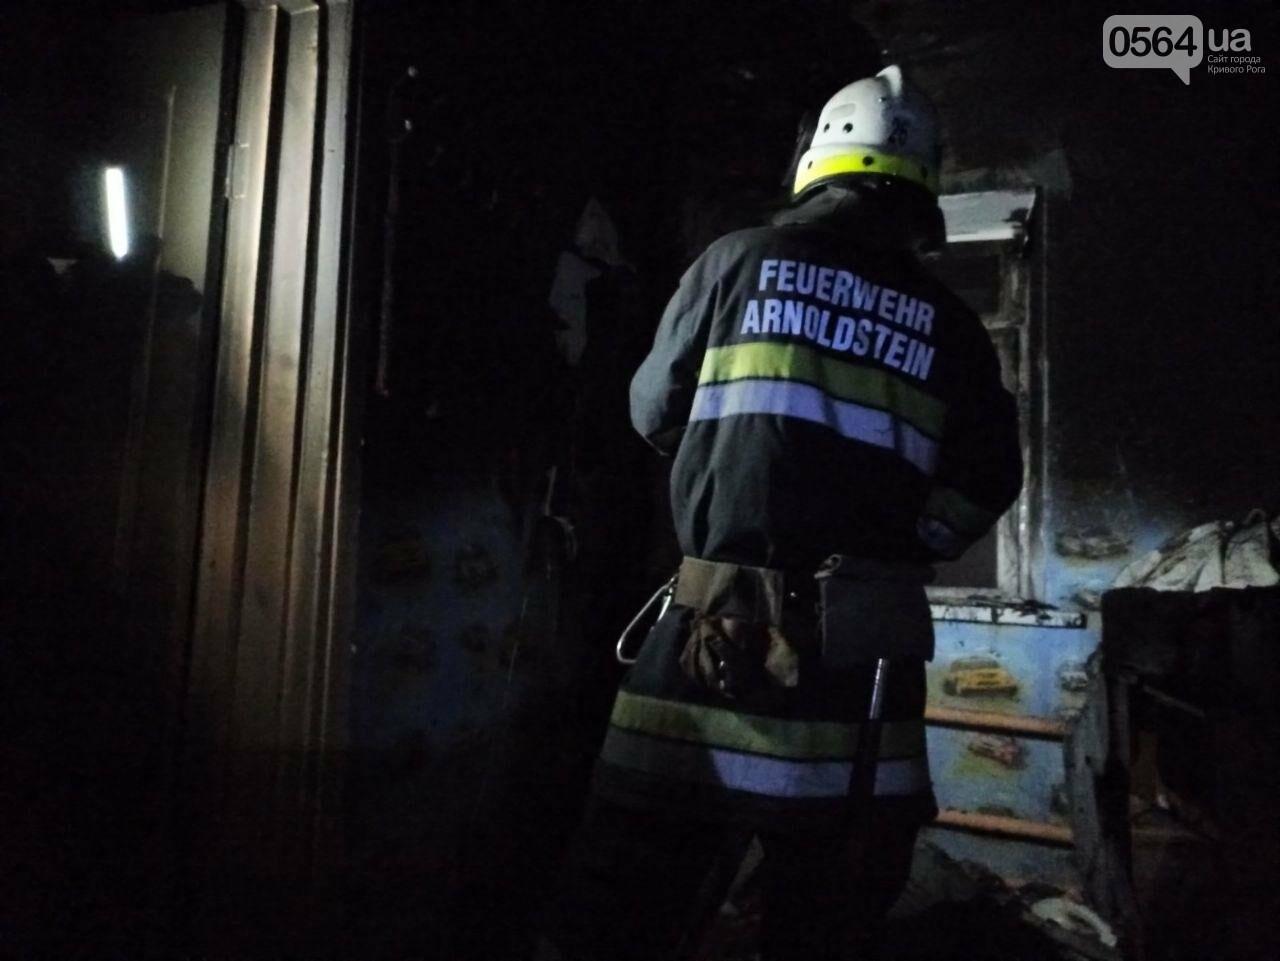 Во время пожара в Кривом Роге пострадал 70-летний пенсионер, - ФОТО , фото-3